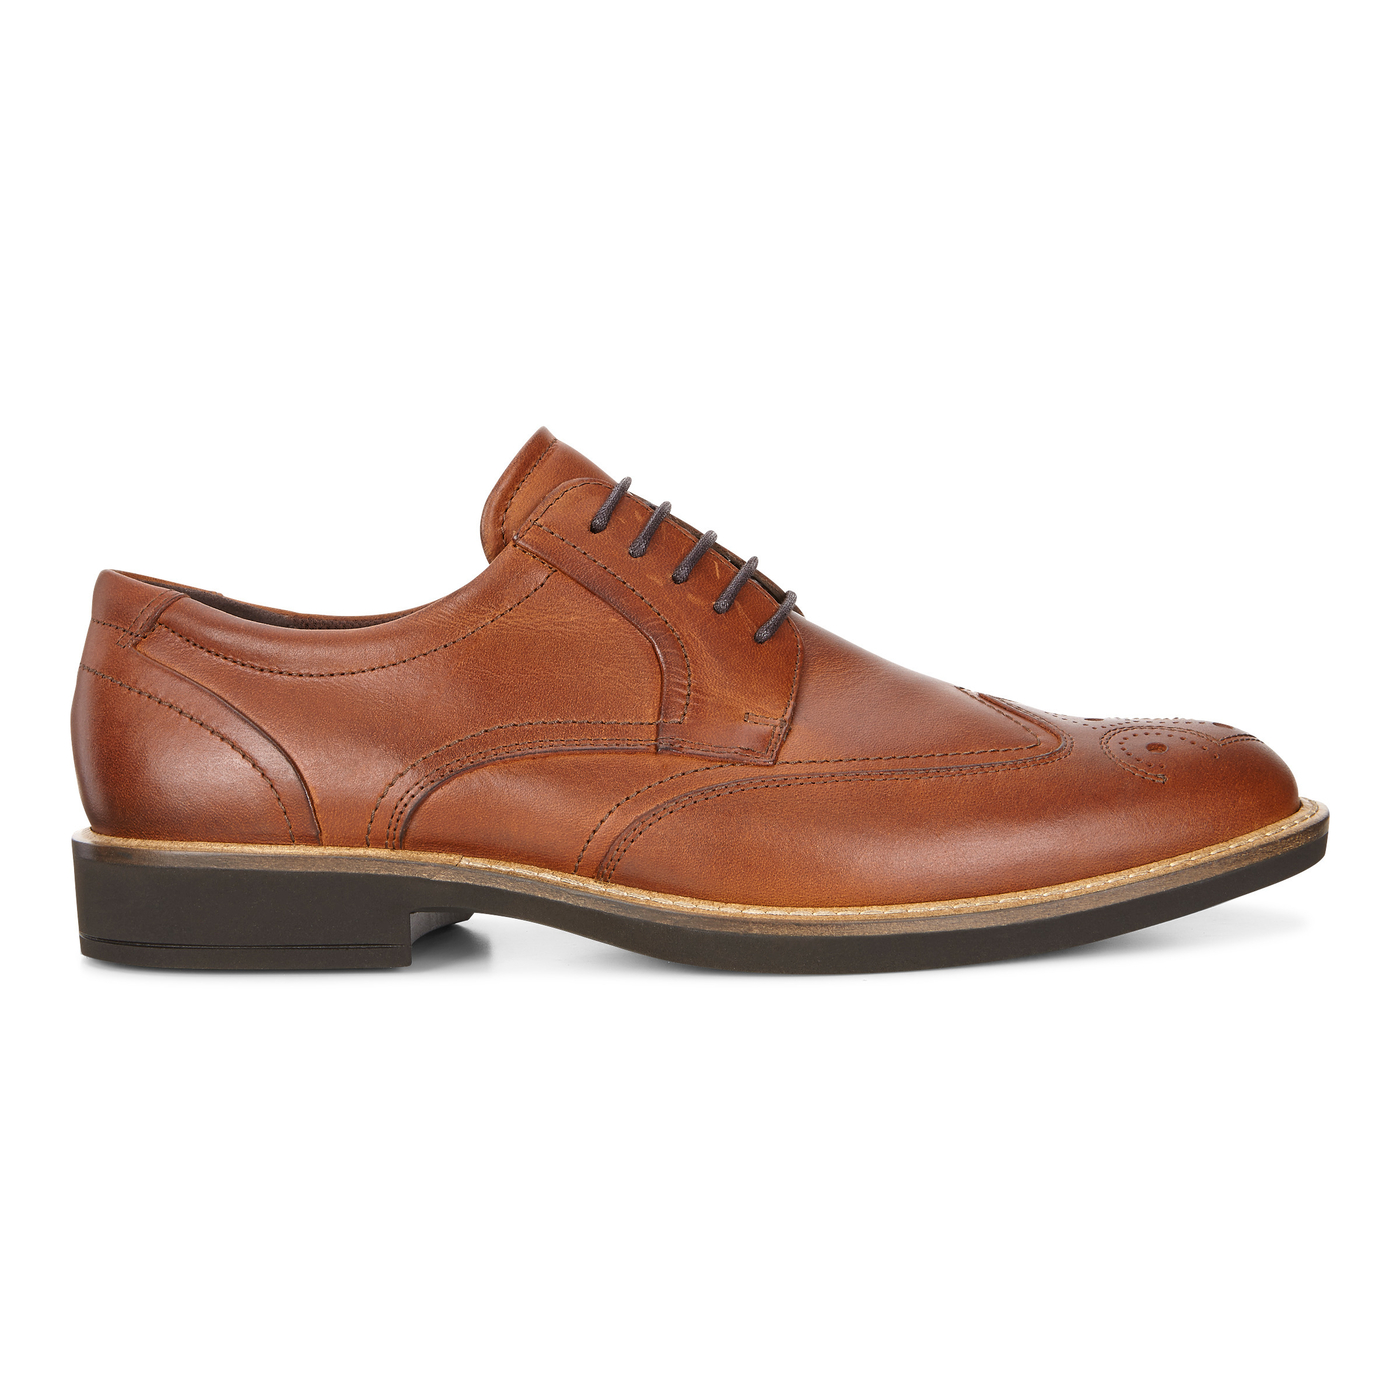 ECCO BIARRITZ Shoe